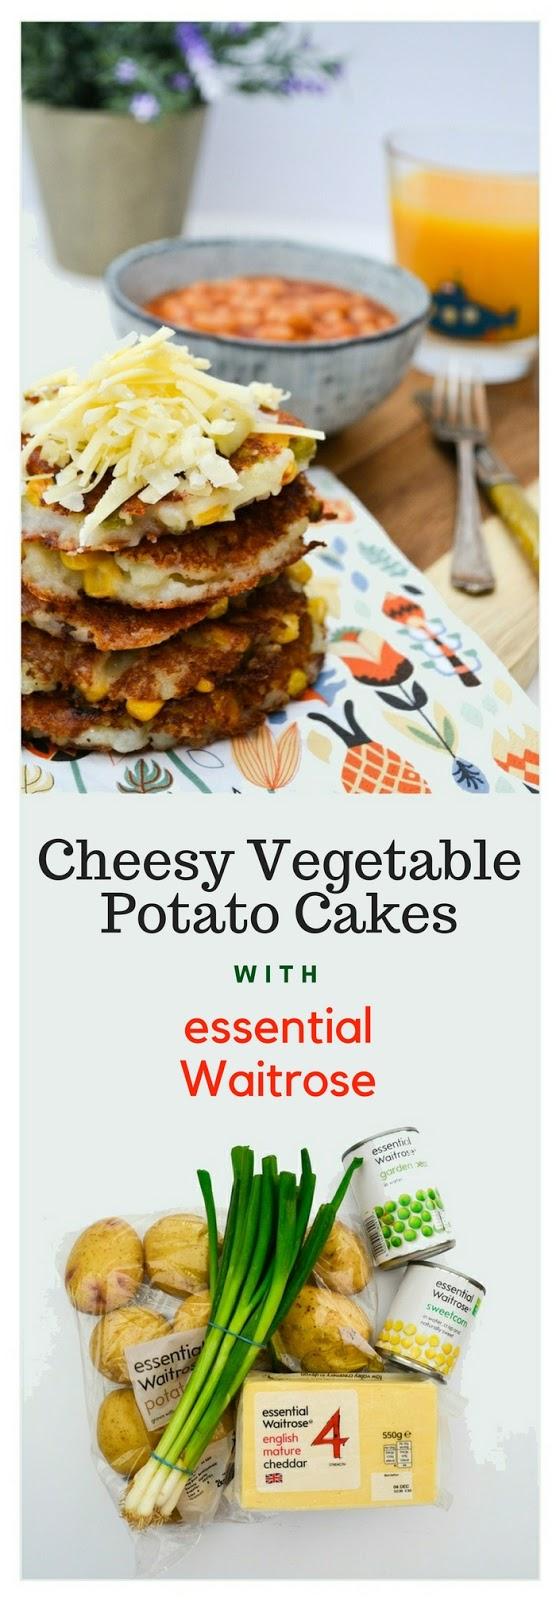 Easy Cheesy Vegetable Potato Cakes